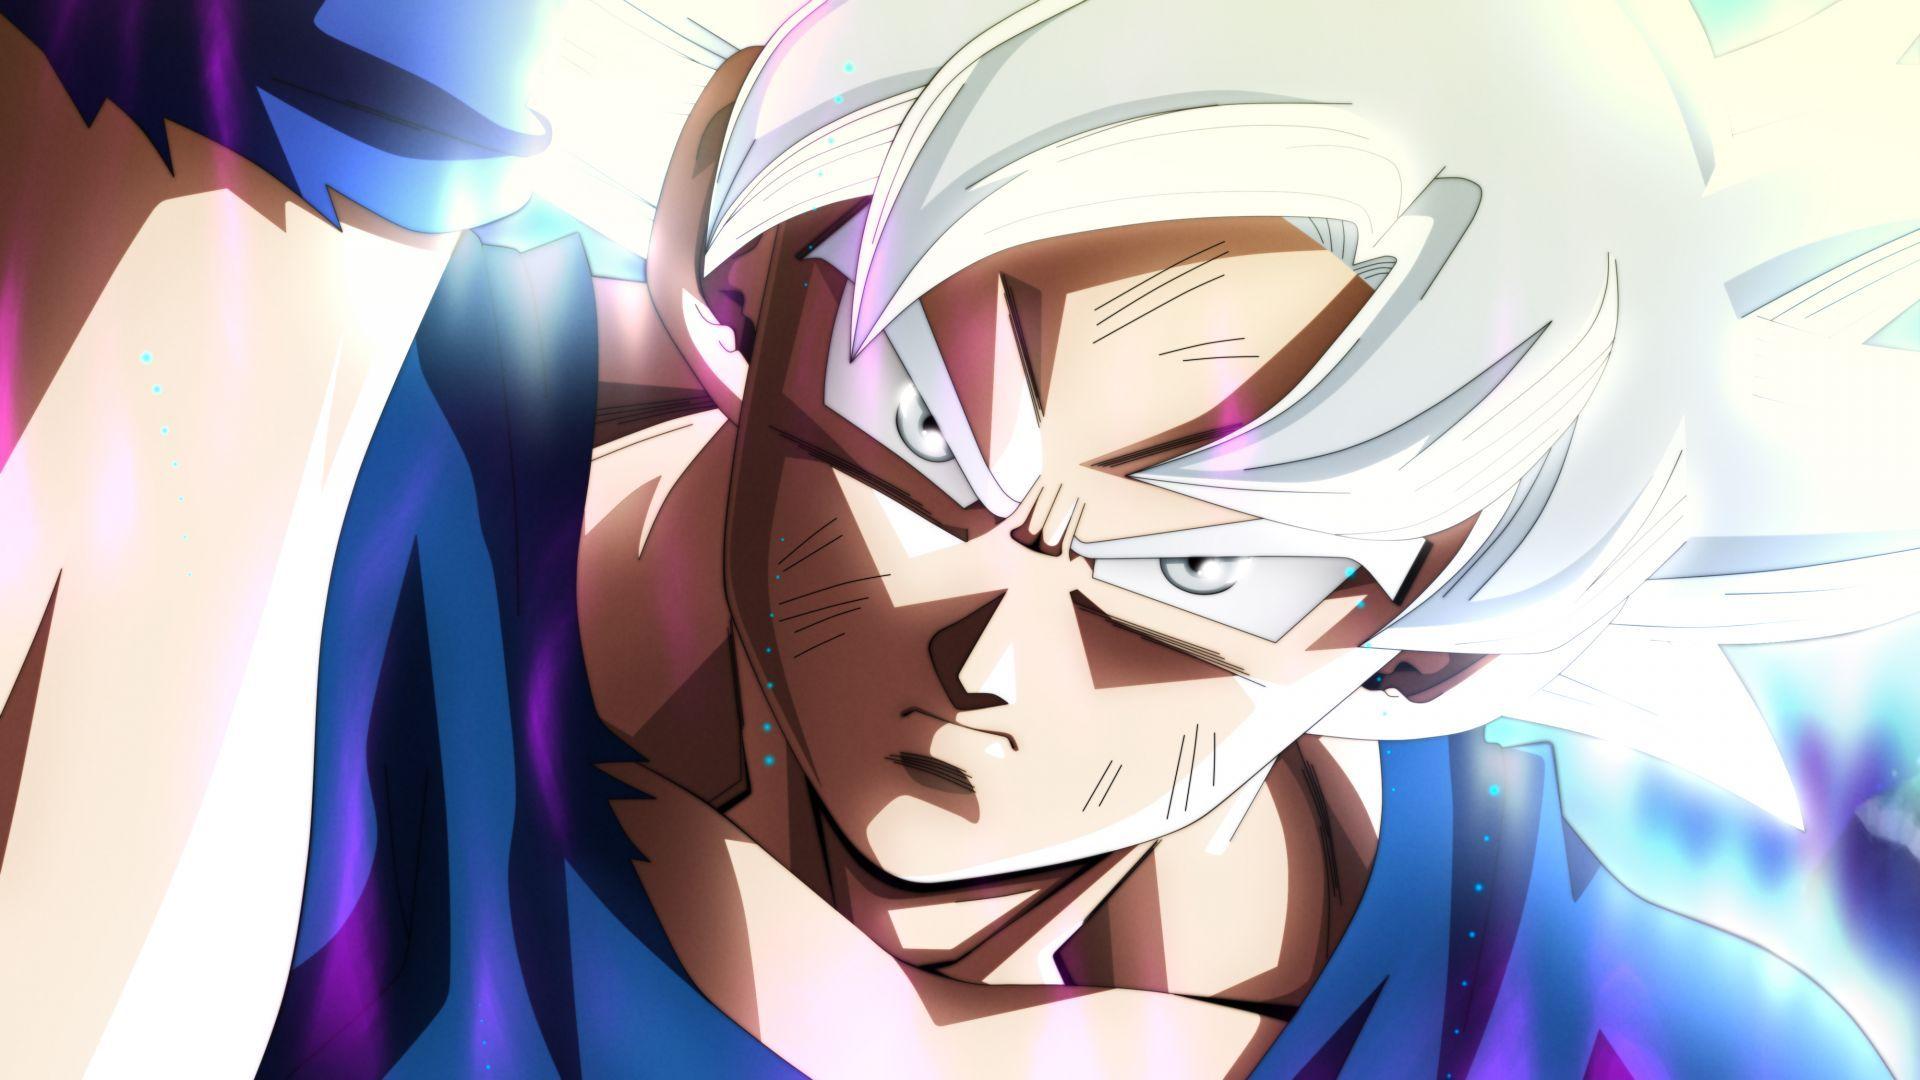 Download Wallpapers Of Ultra Instinct Goku Dragon Ball Super 4k Anime 12729 Available Dragon Ball Wallpapers Goku Wallpaper Dragon Ball Super Wallpapers